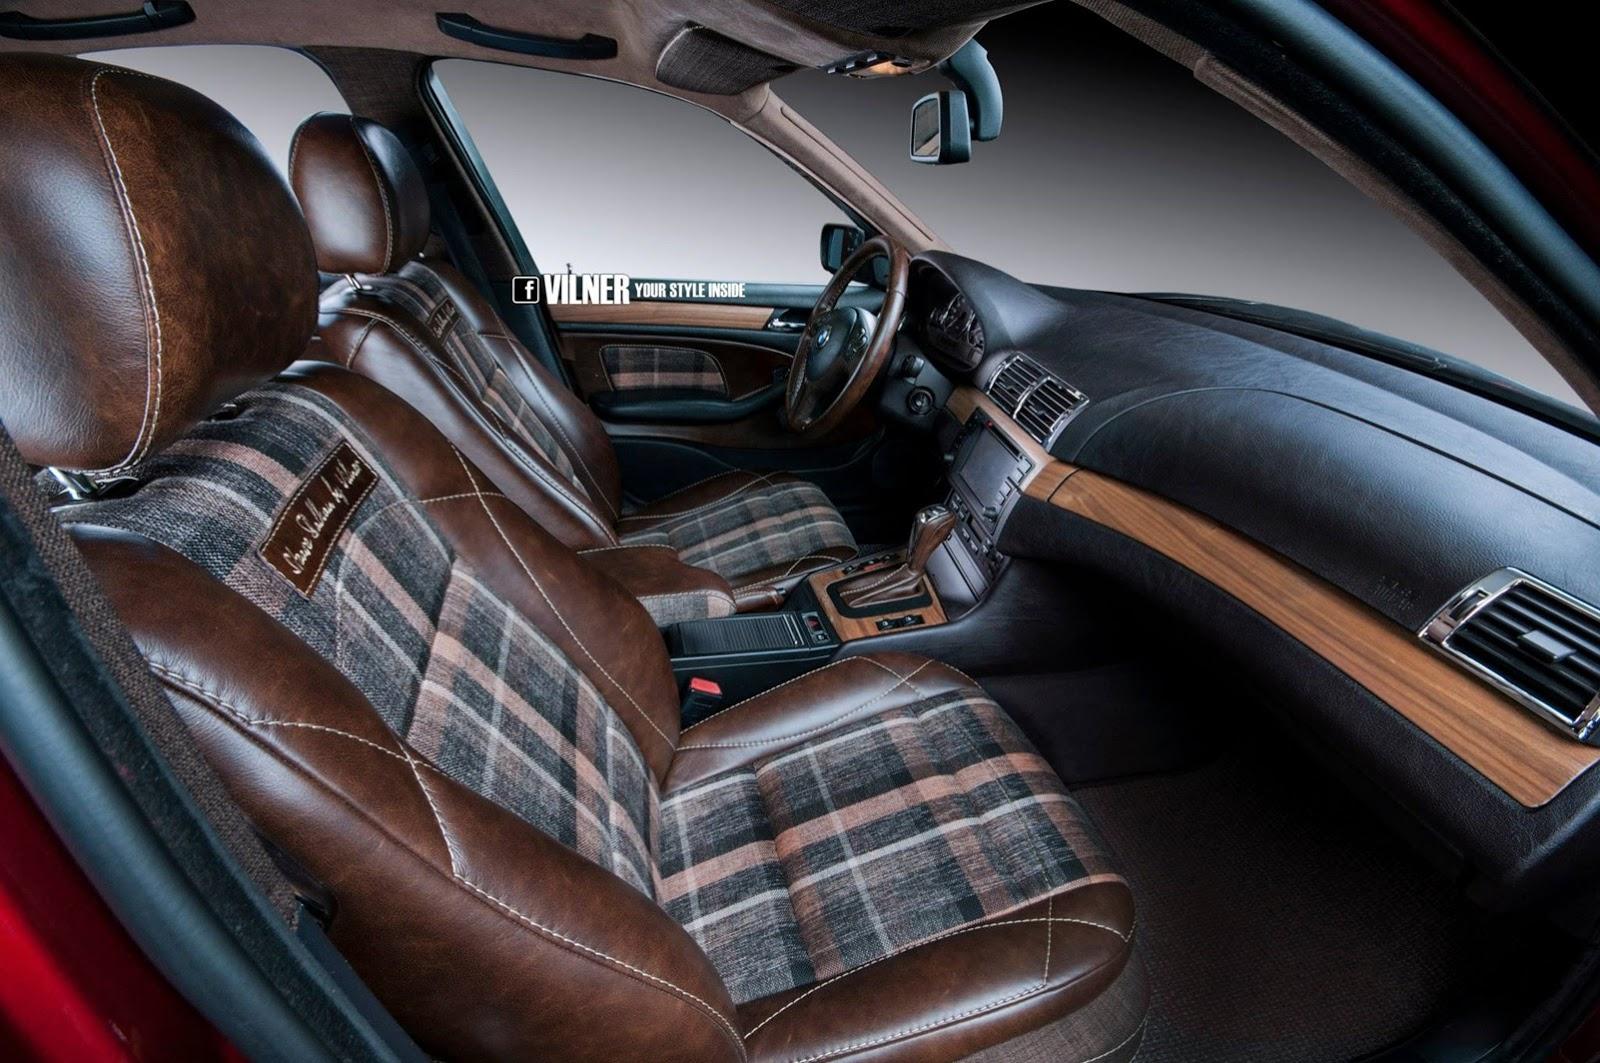 BMW E46 3 Series Gets Hipster Interior From Vilner